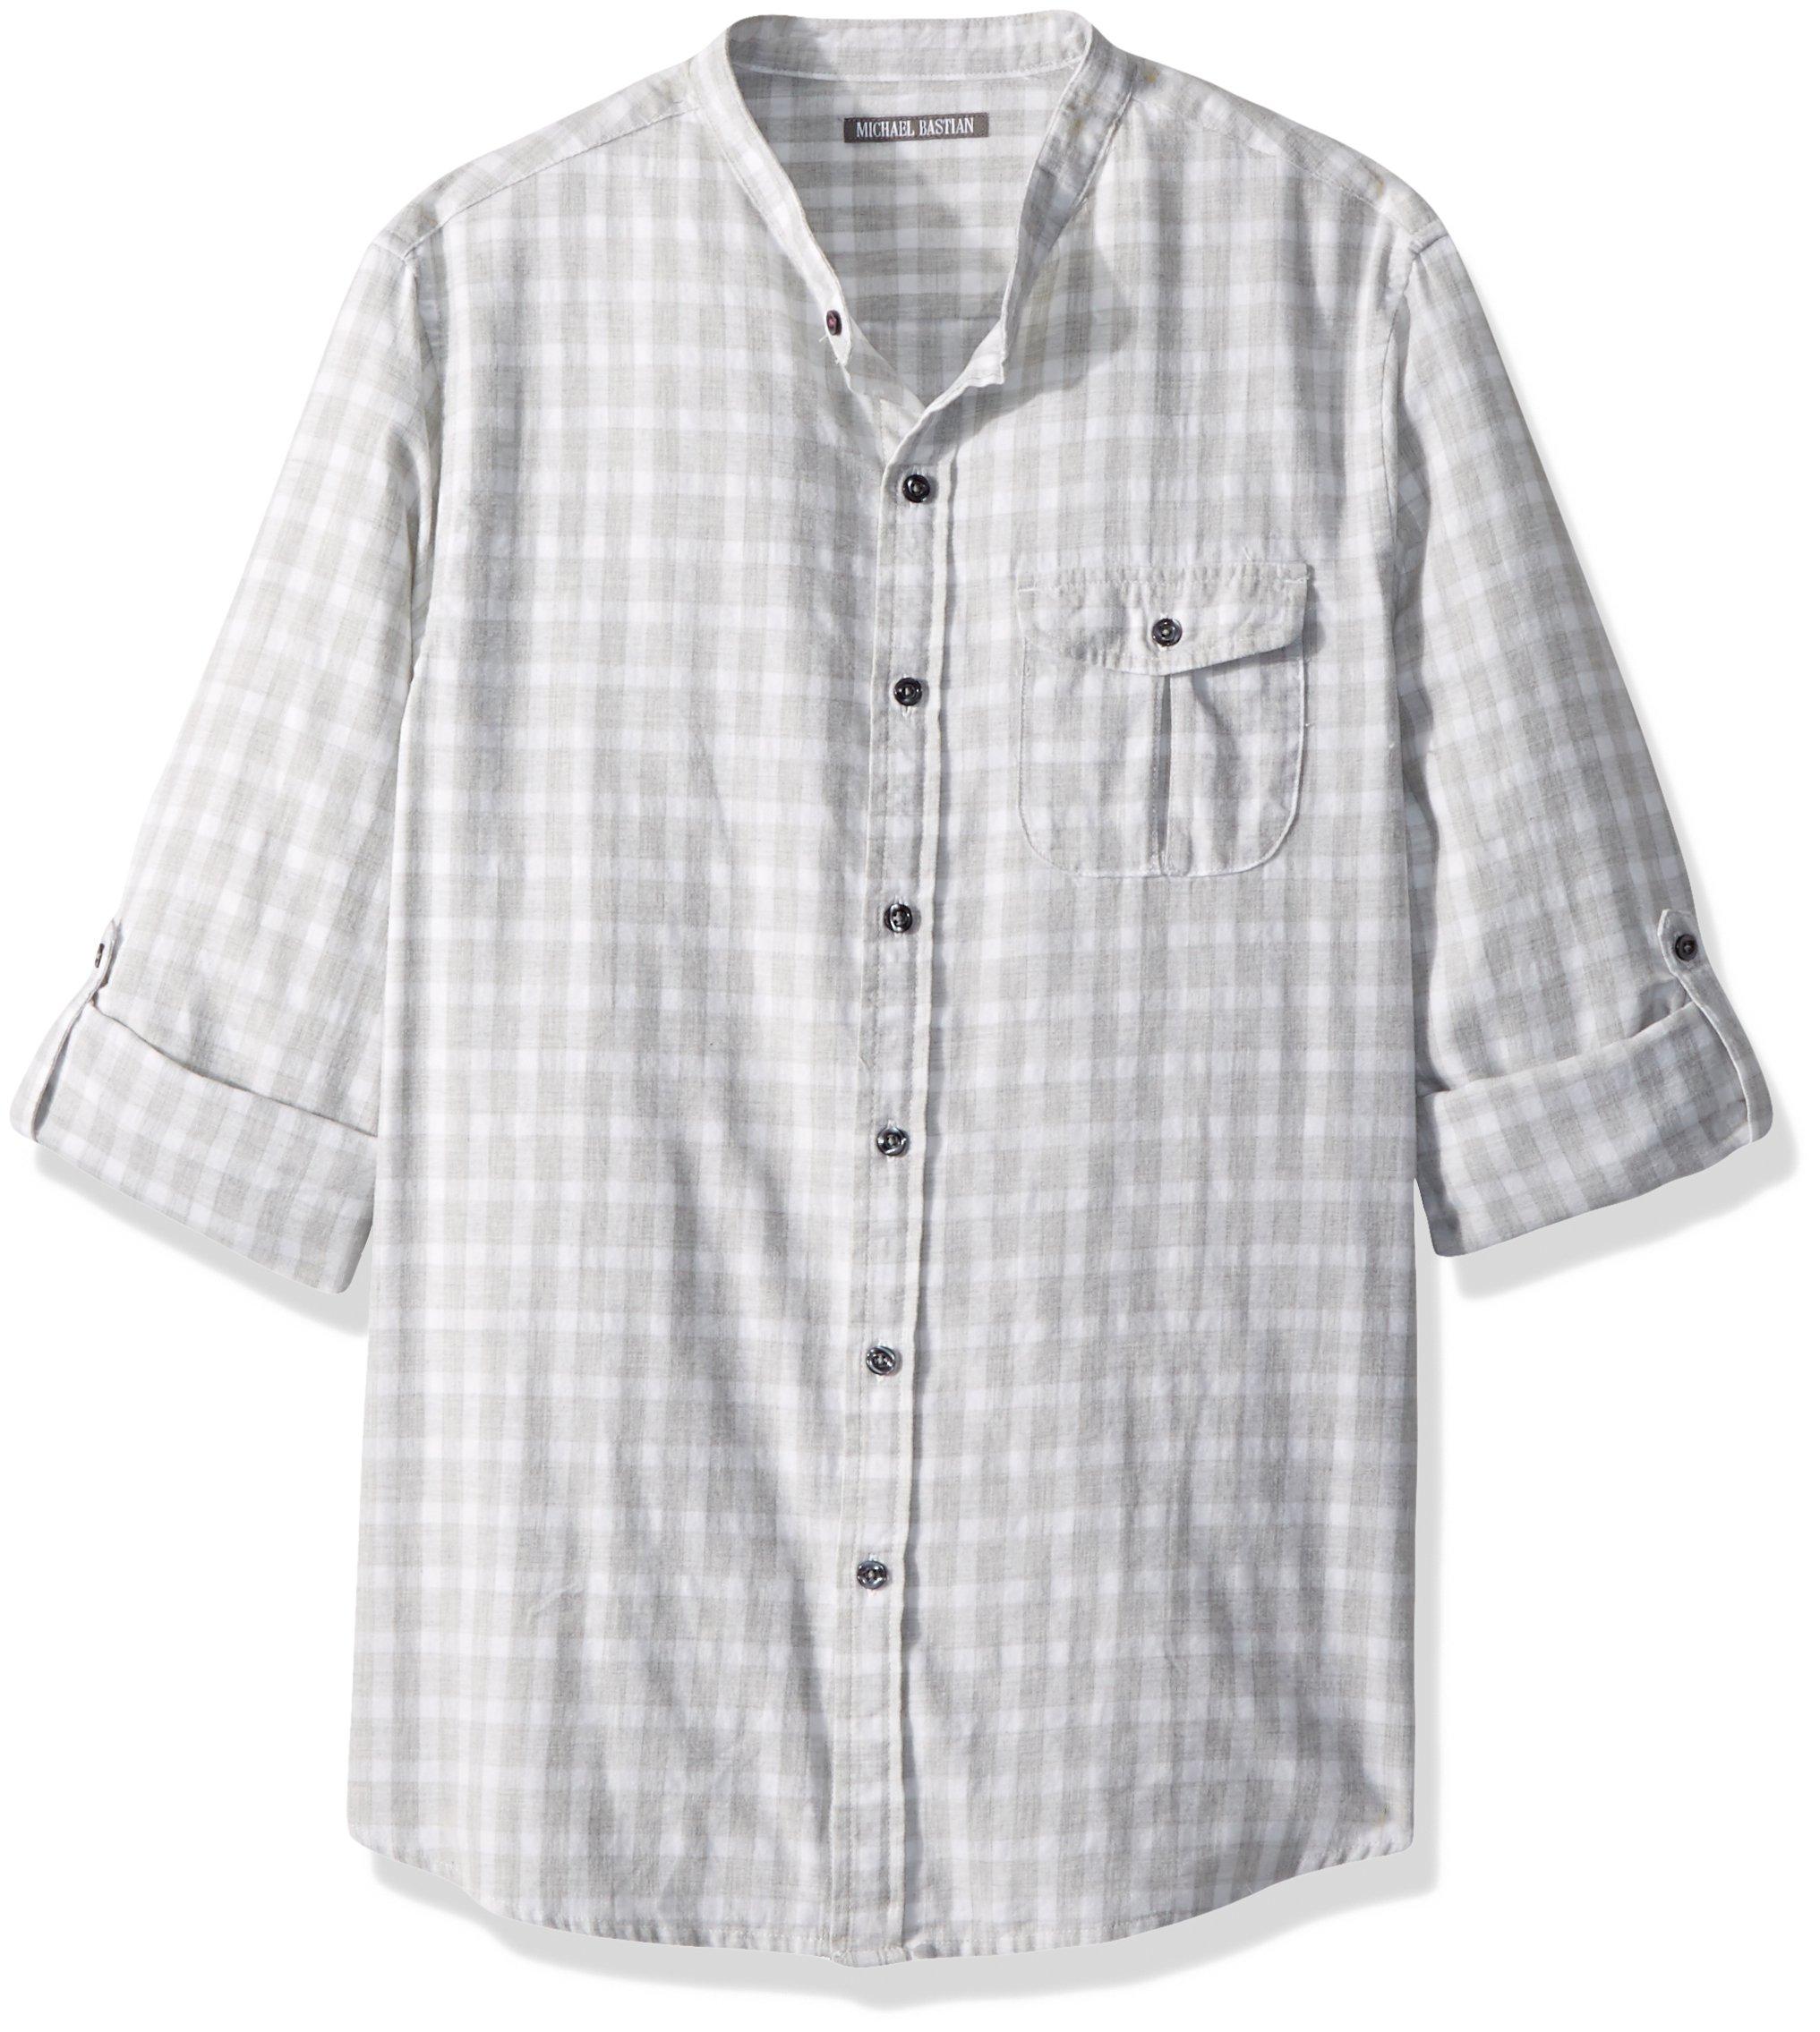 Michael Bastian Men's Long Sleeve Band Collar Windowpane Plaid Woven Shirt, Heather Gray, Large